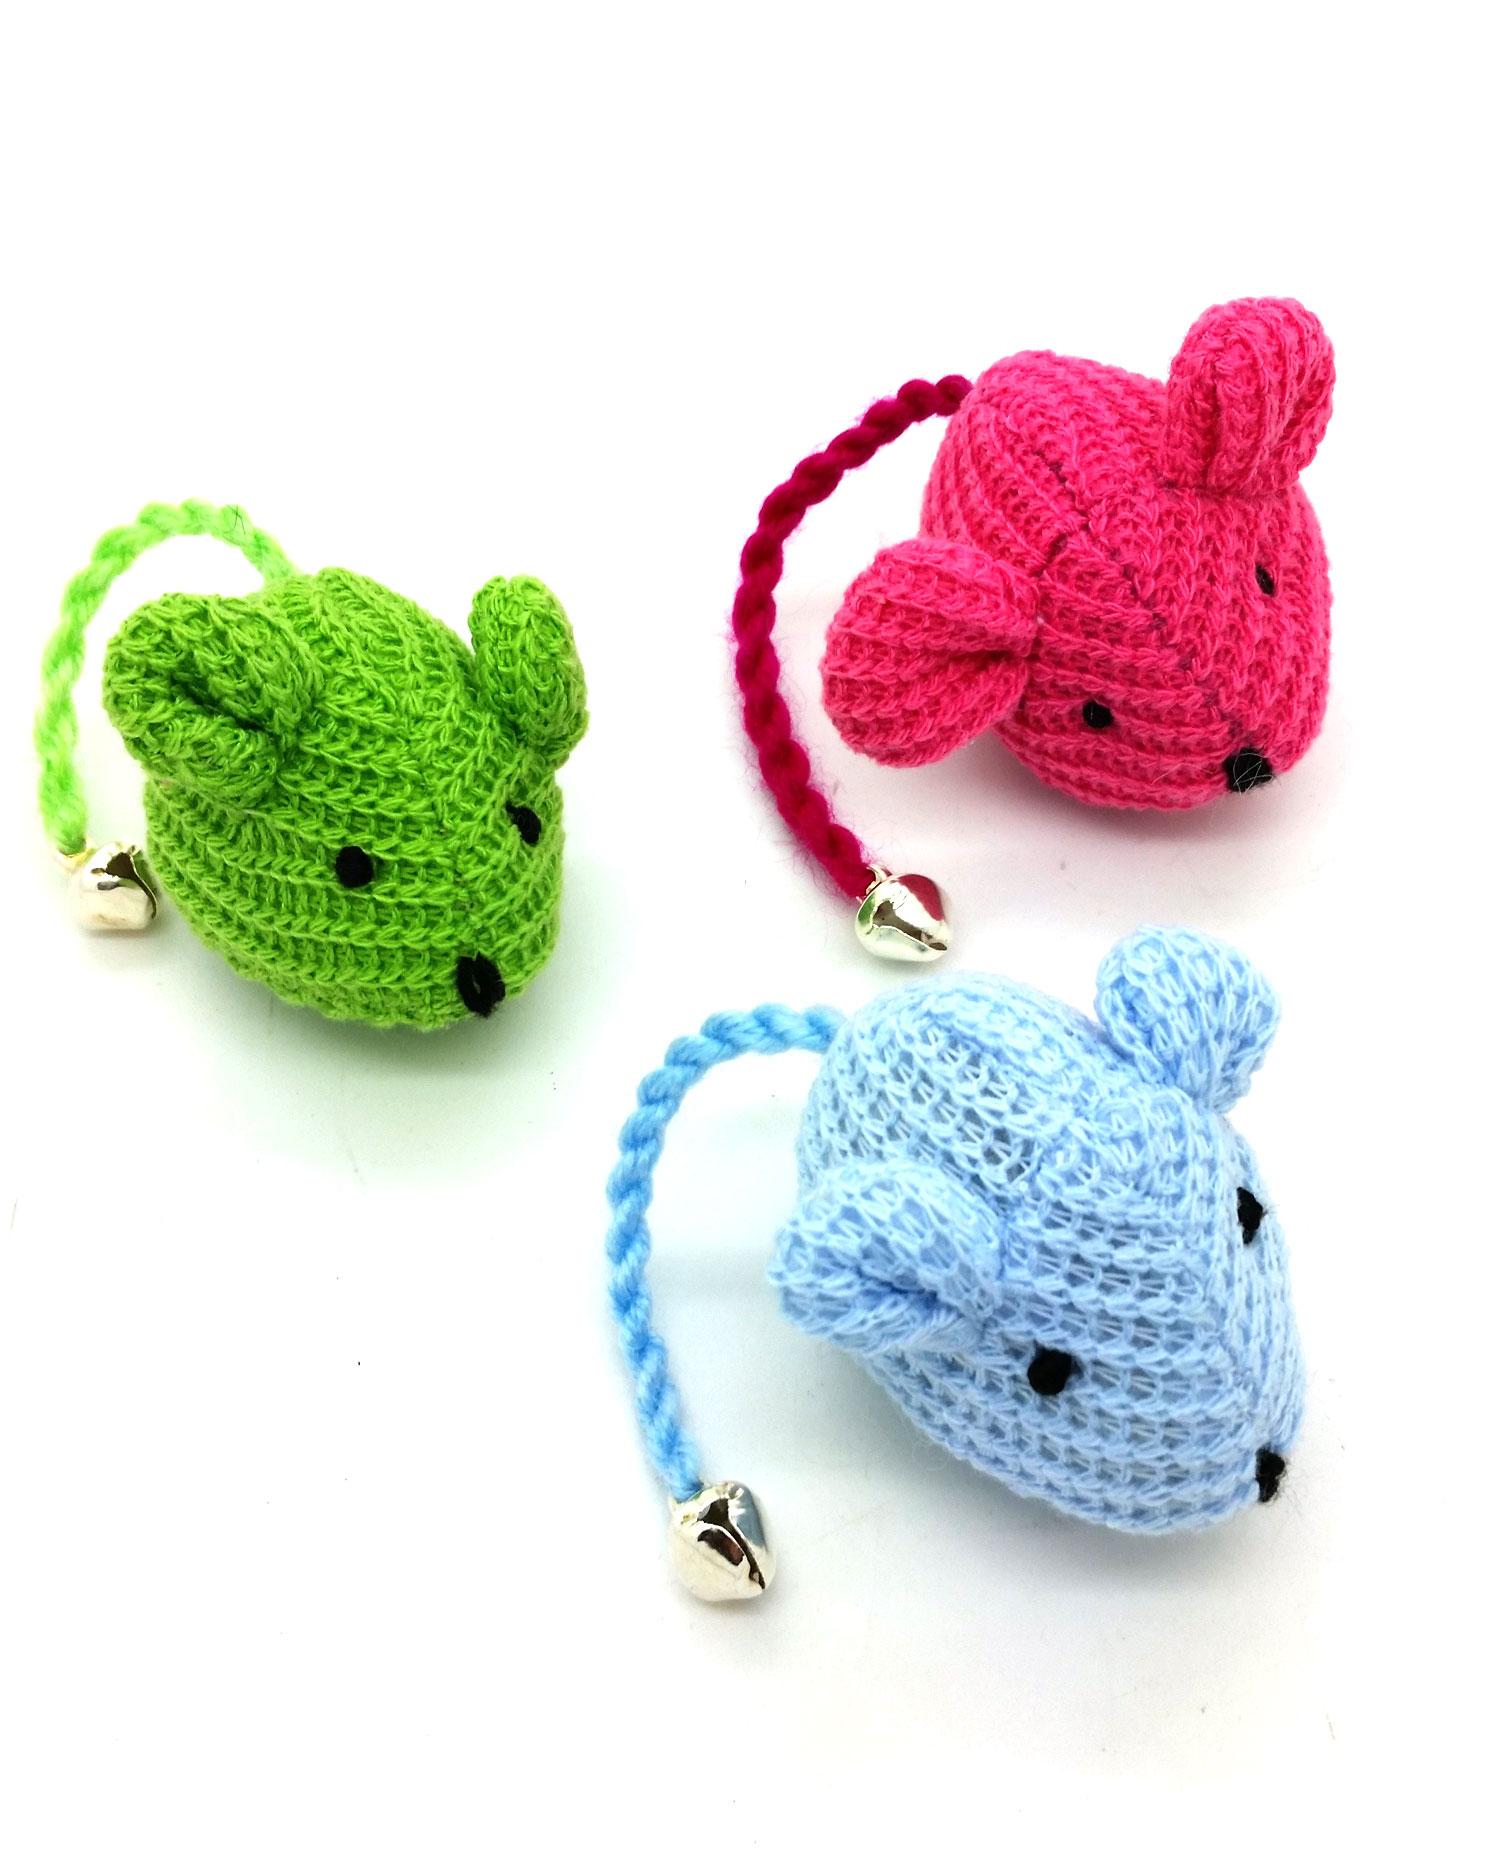 crochetmicepknew.jpg